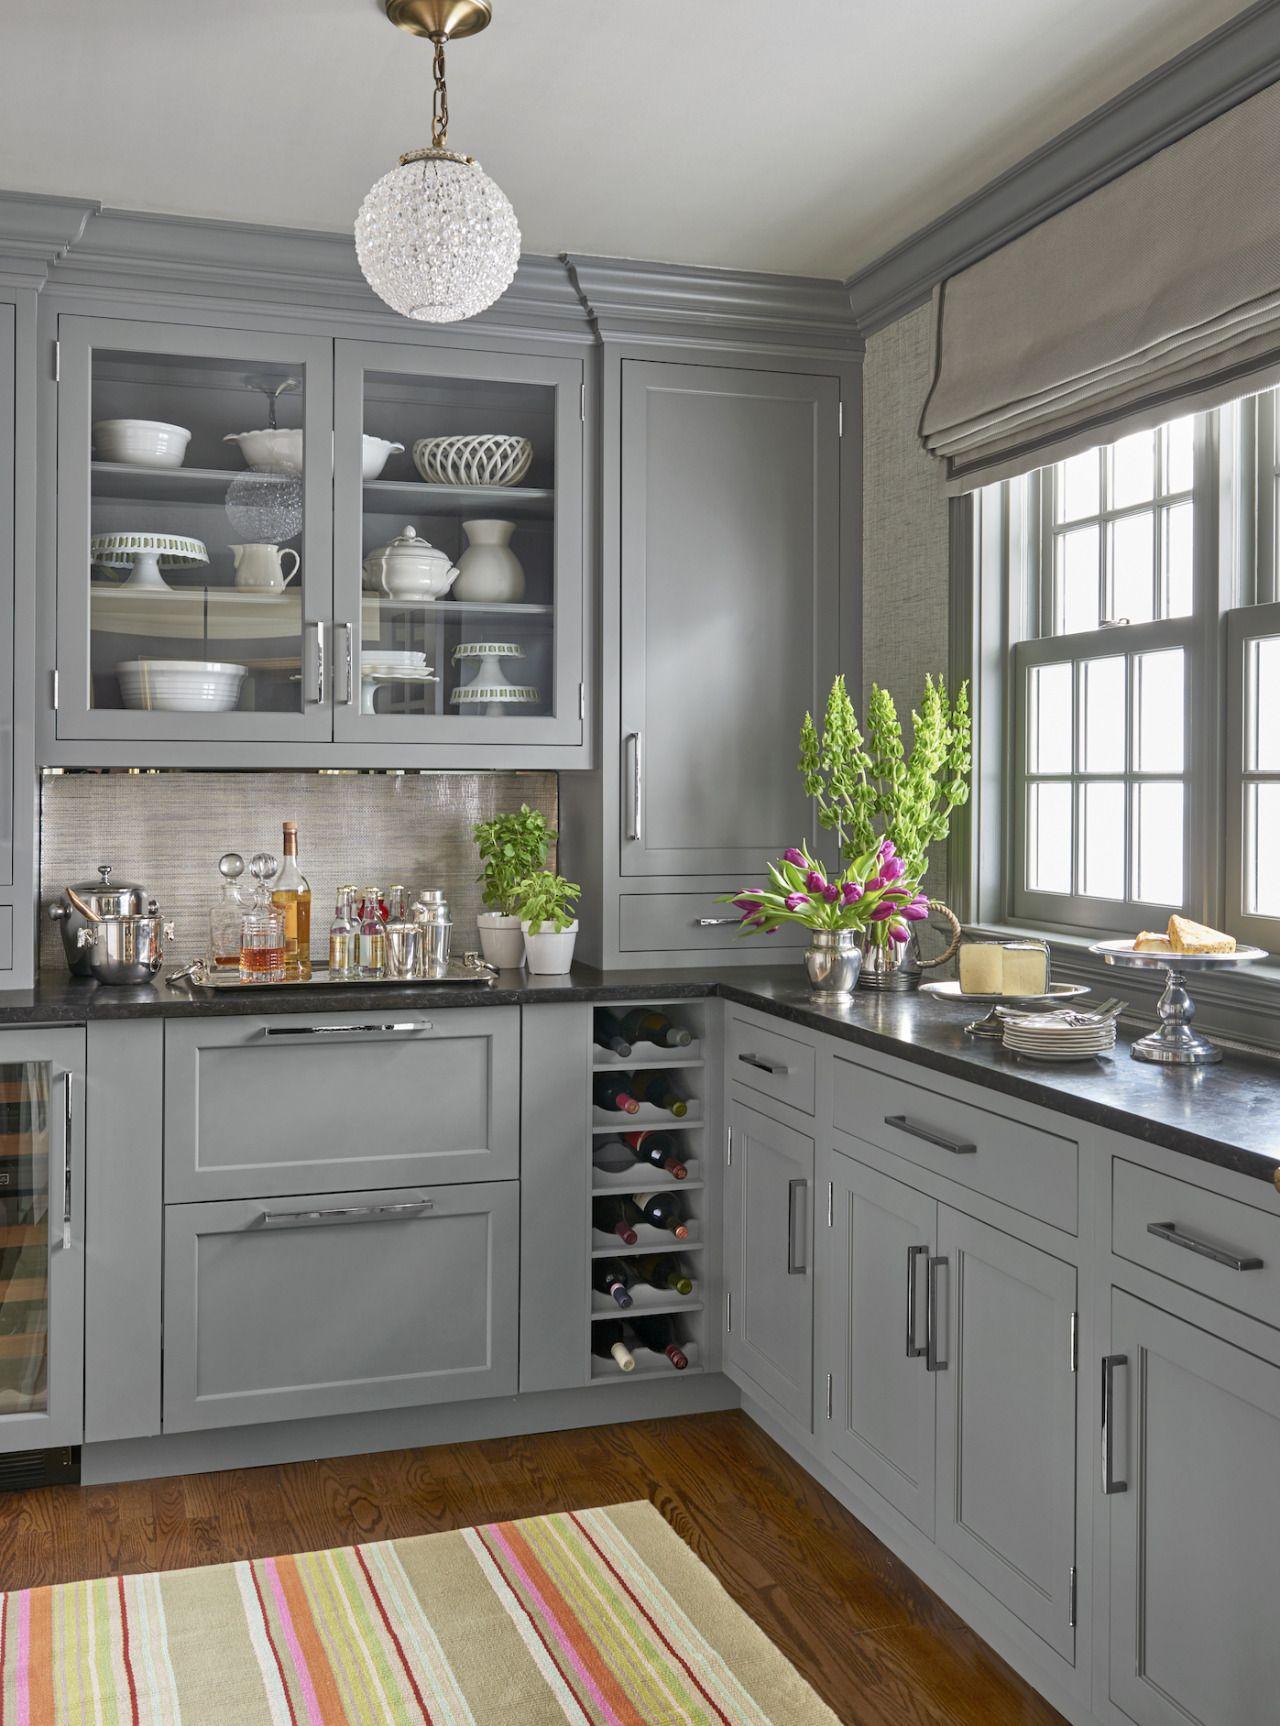 Interior Design and Landscaping Kitchen remodel